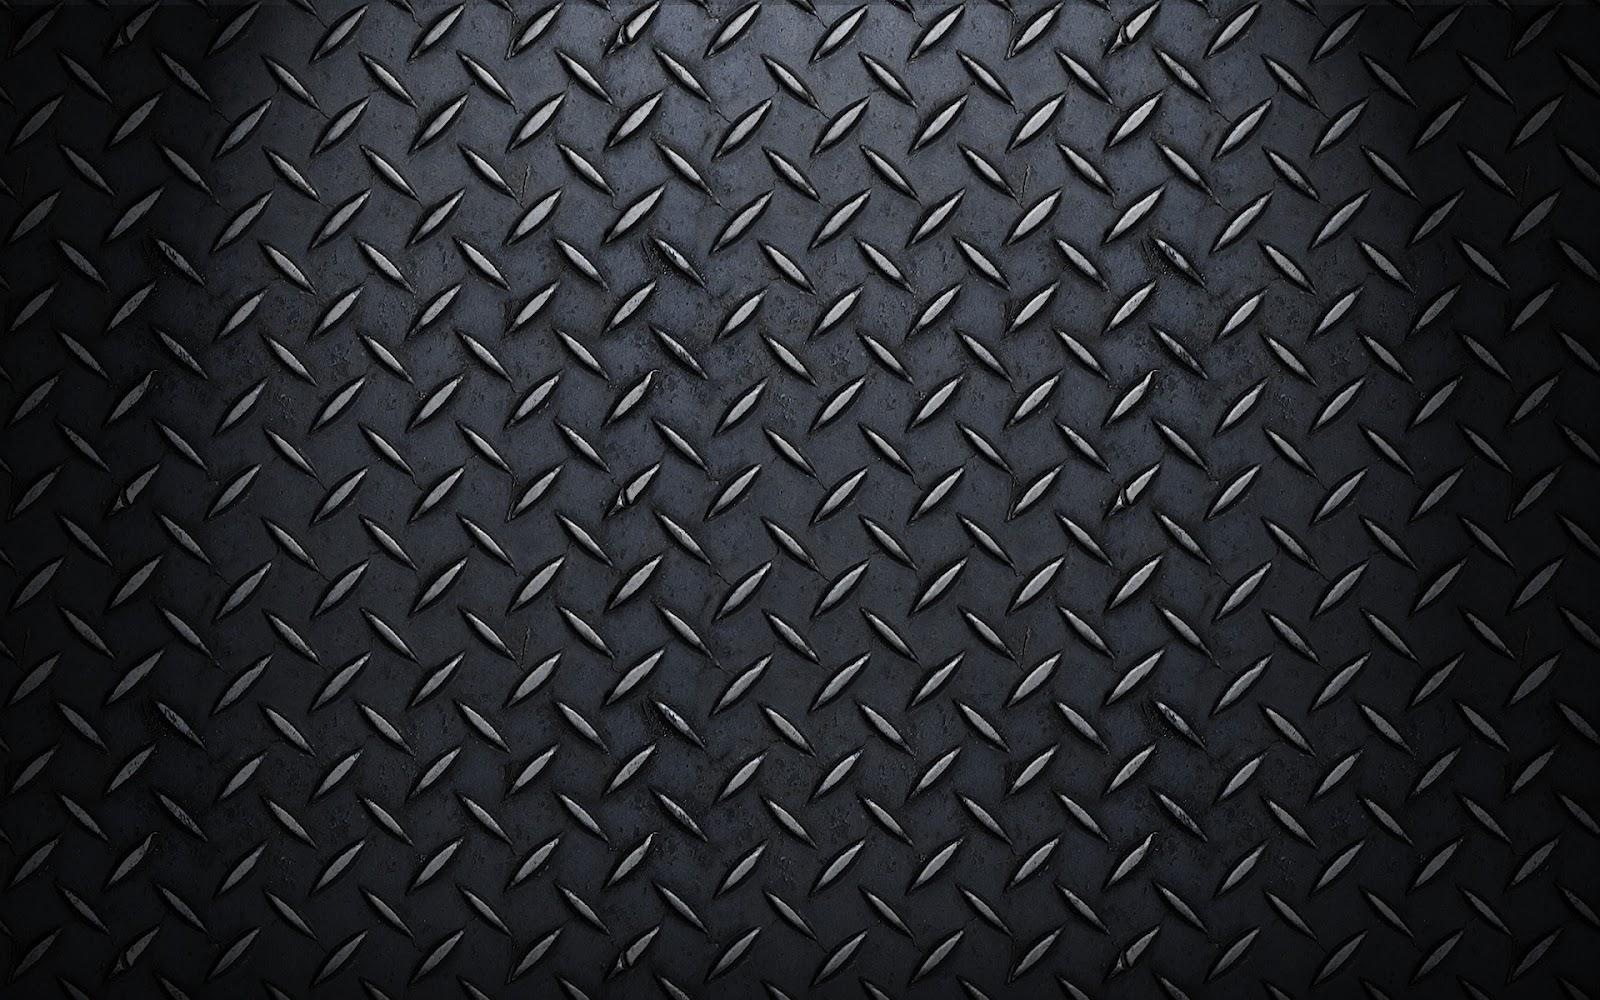 Mr. A: 1920x1200 HD Website Backgrounds